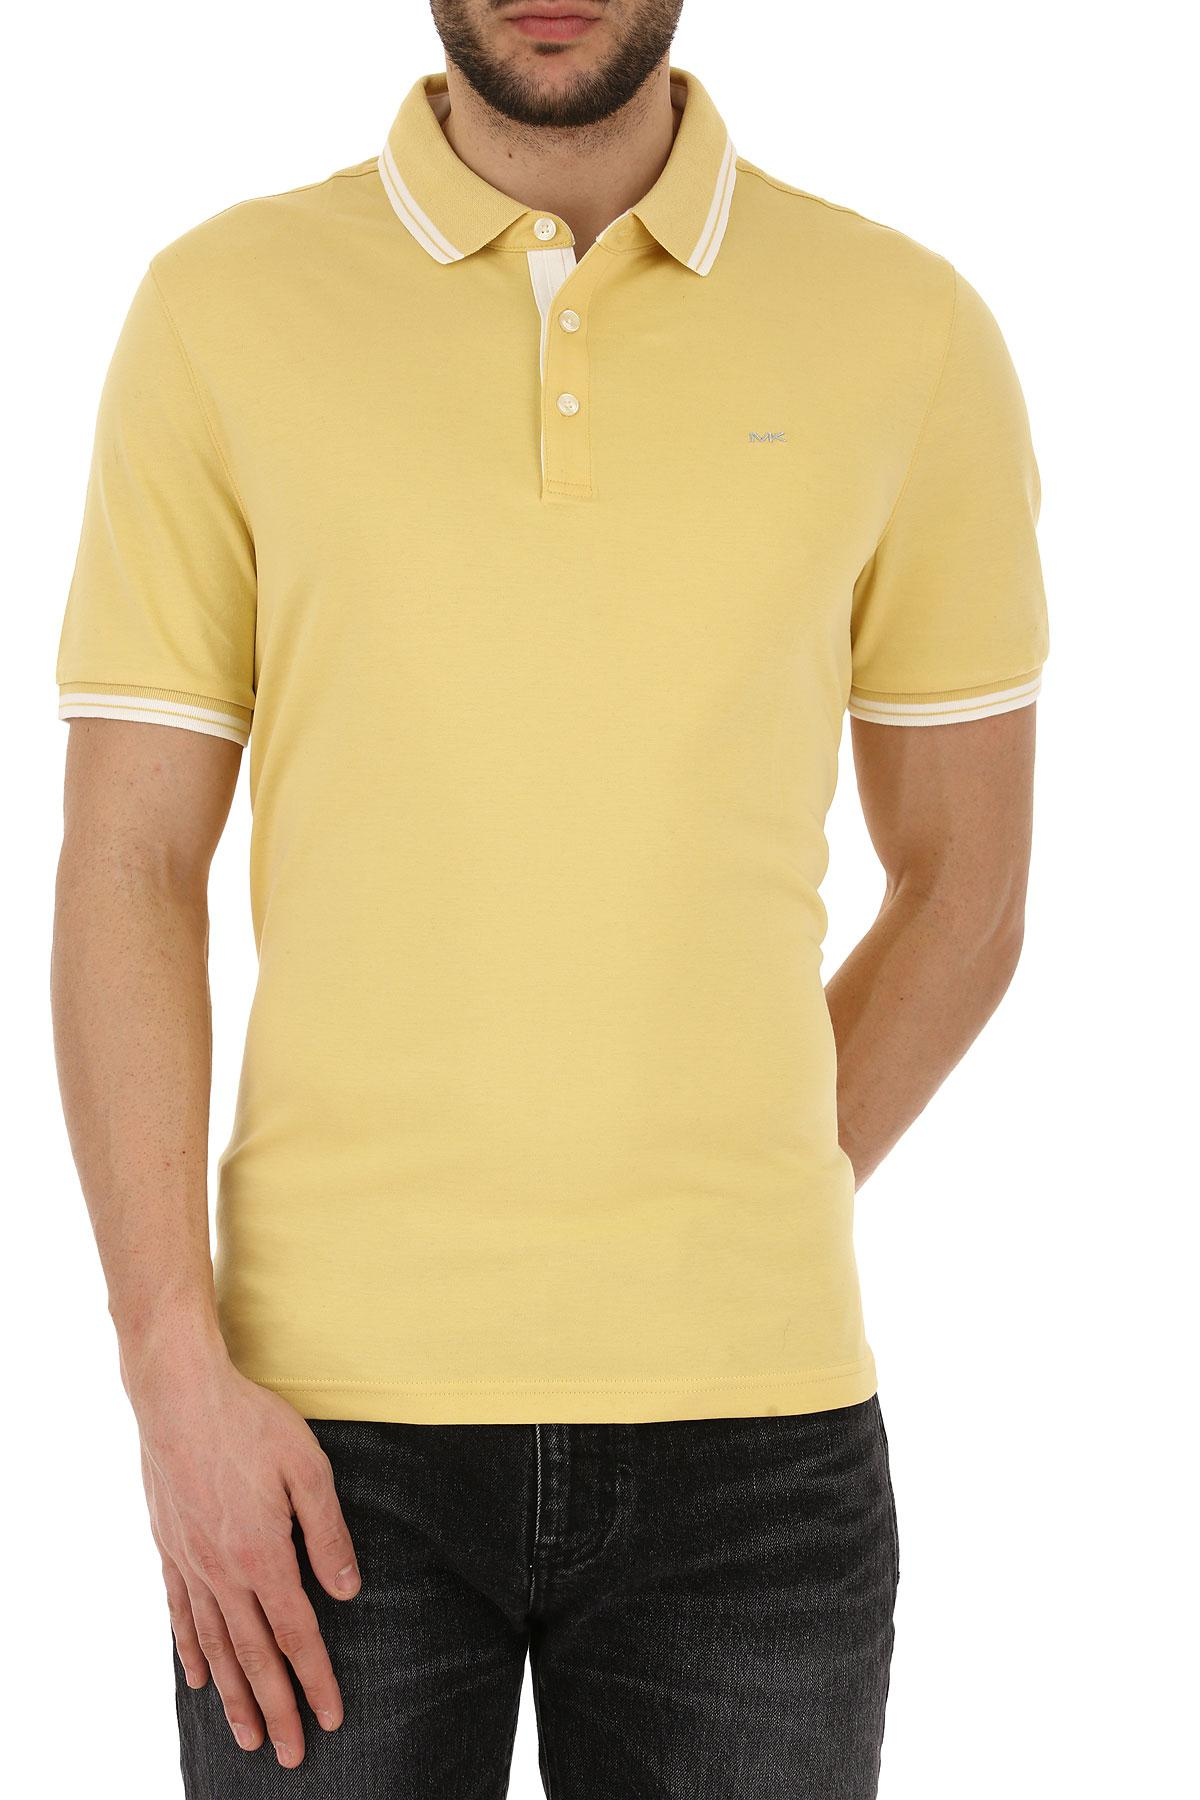 e48dac9b2 Michael Kors - Yellow Clothing For Men for Men - Lyst. View fullscreen